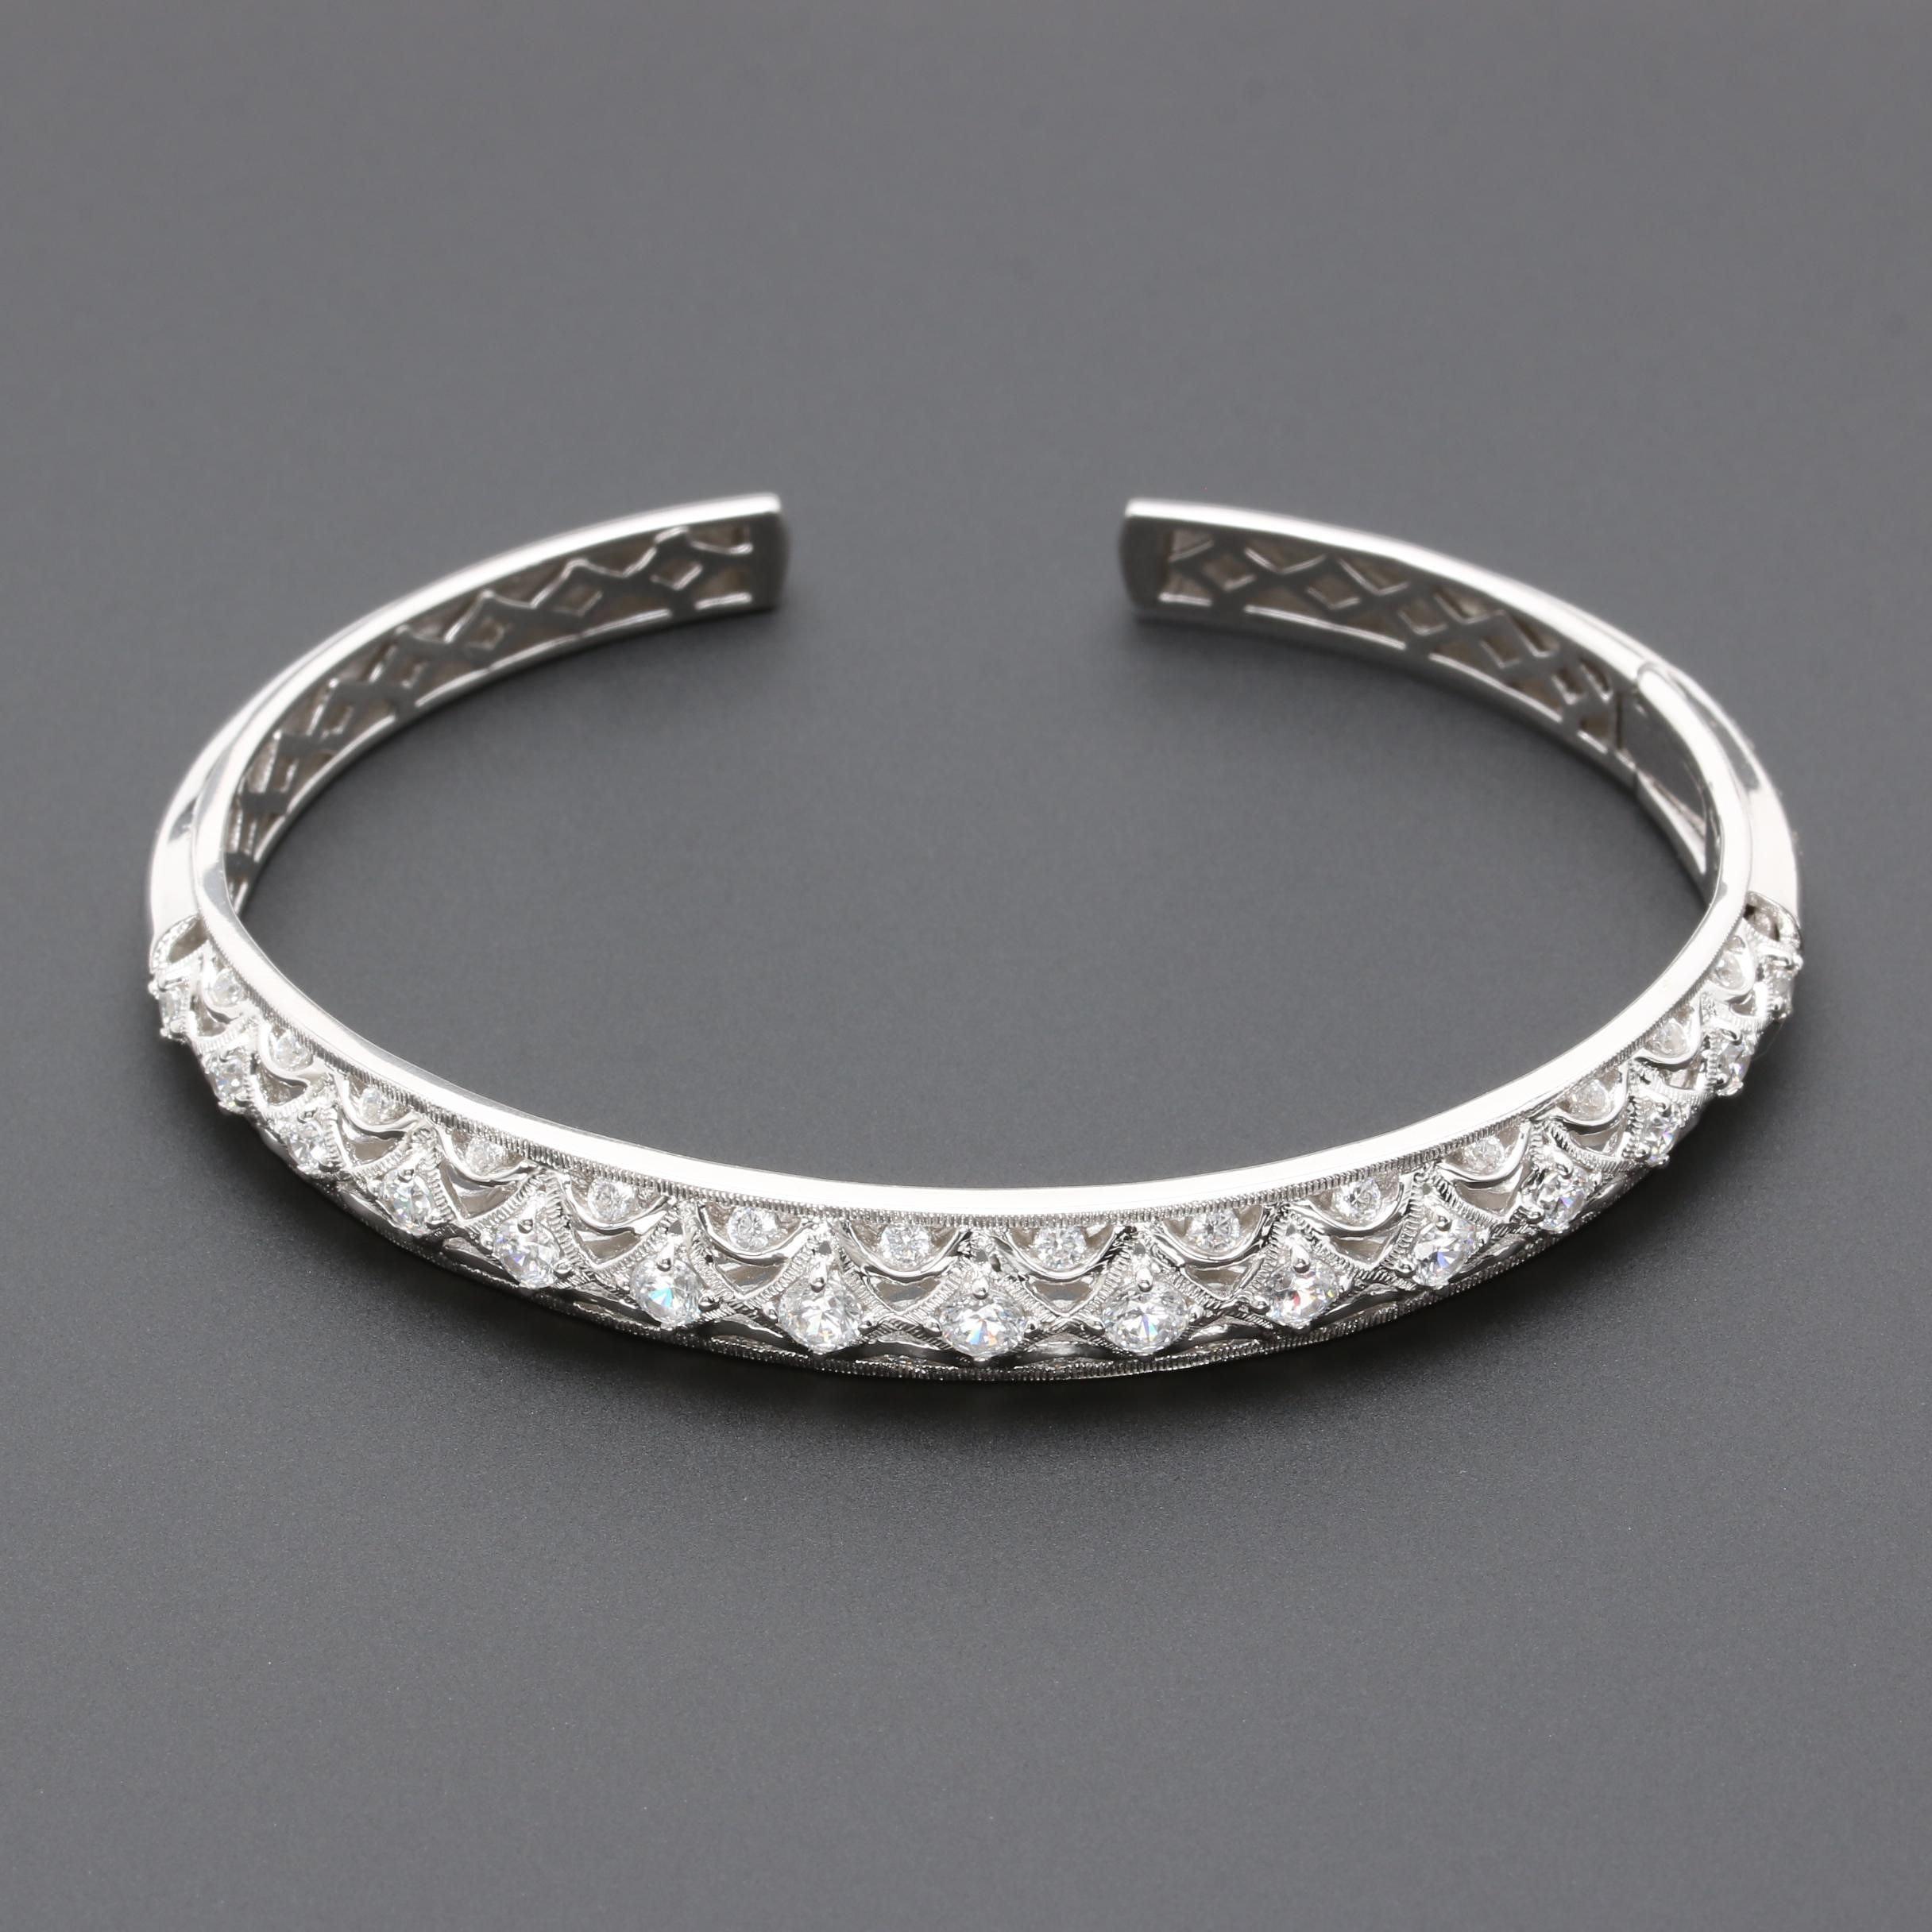 Tacori Sterling Silver Cubic Zirconia Thin Openwork Hinged Cuff Bracelet